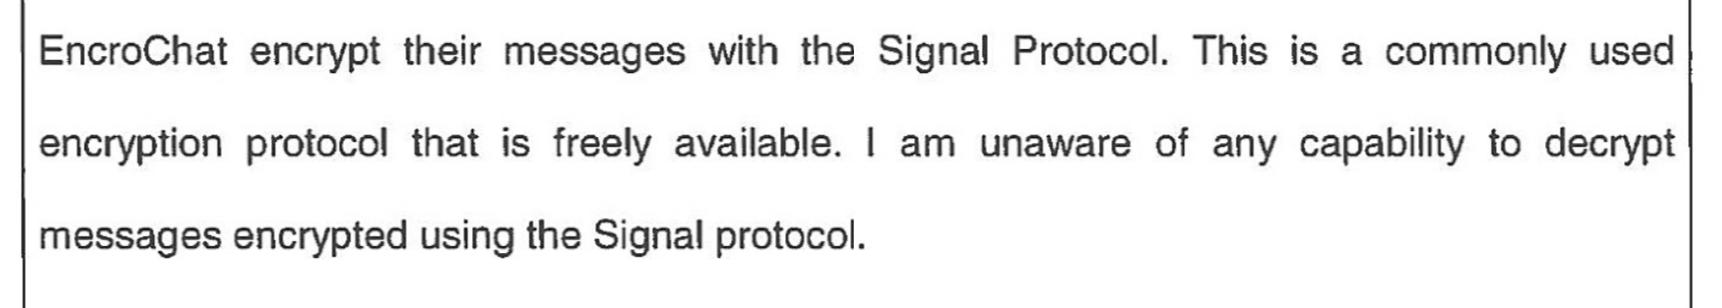 encrochat-signal-protocol.png